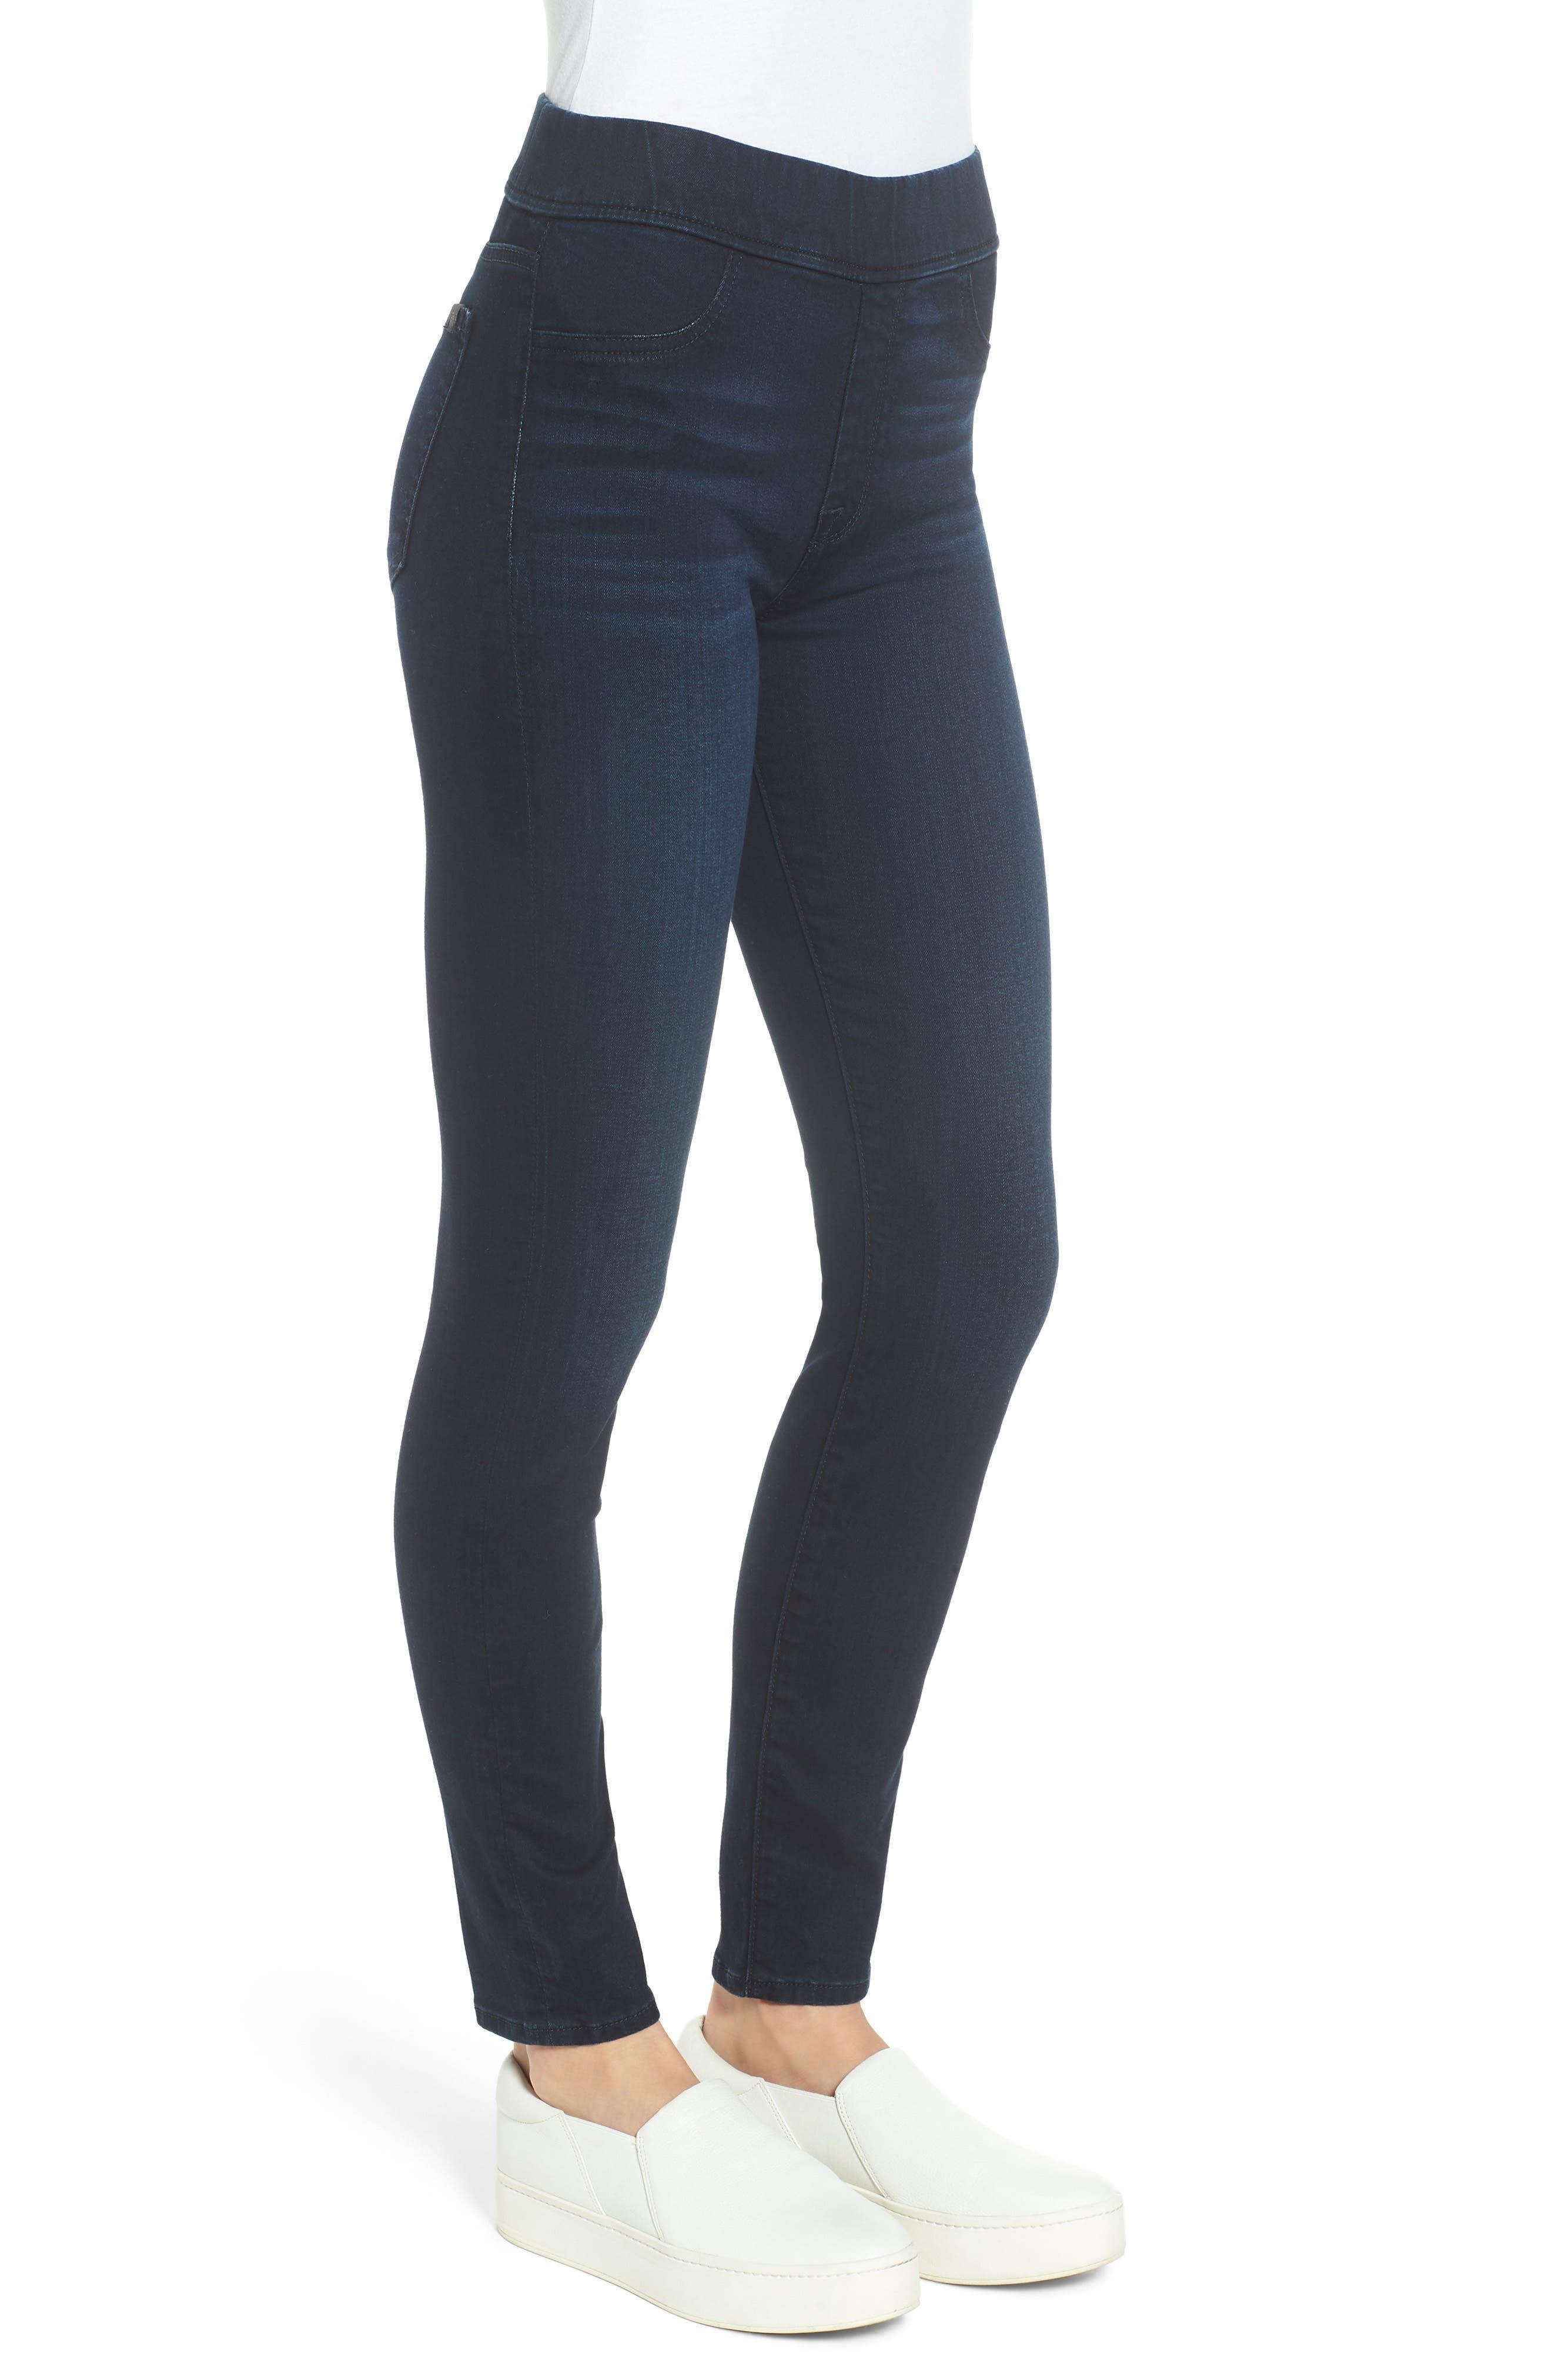 JEN7 BY 7 FOR ALL MANKIND, Comfort Skinny Denim Leggings, Alternate thumbnail 4, color, RICHE TOUCH BLUE/BLACK